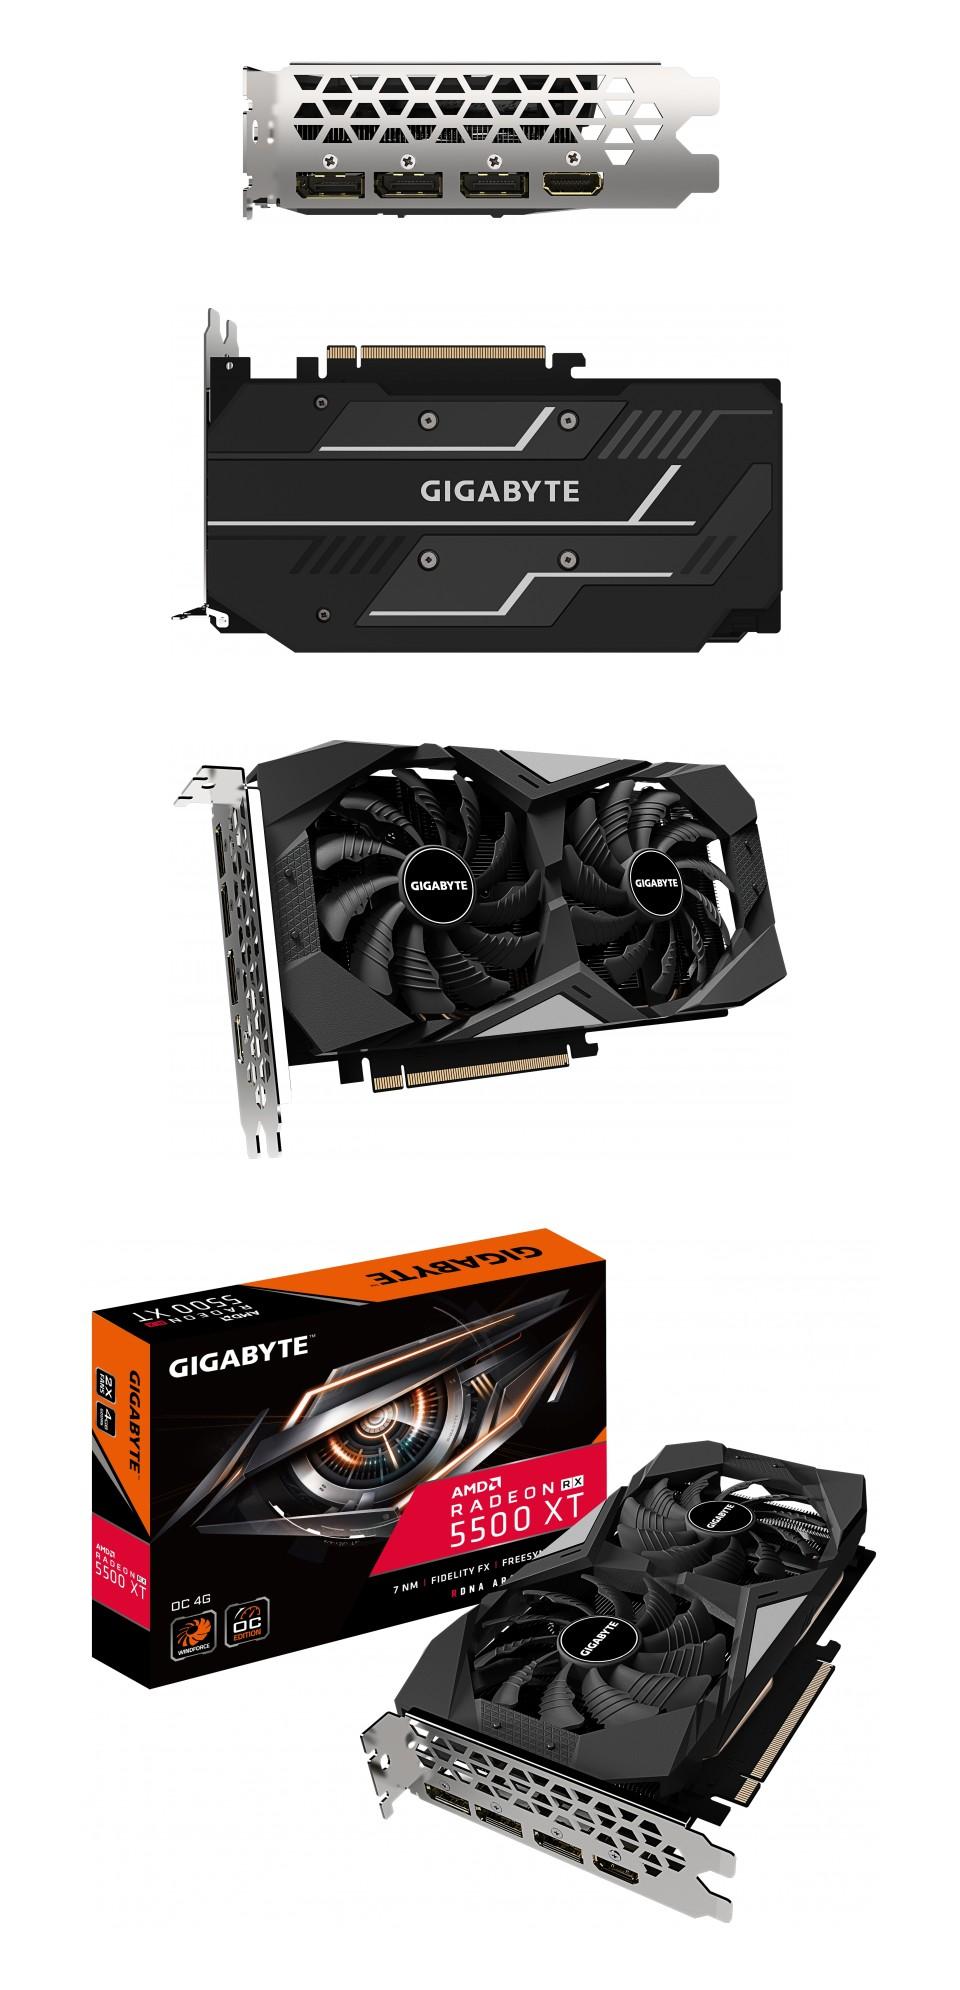 Gigabyte Radeon RX 5500 XT OC 4GB product